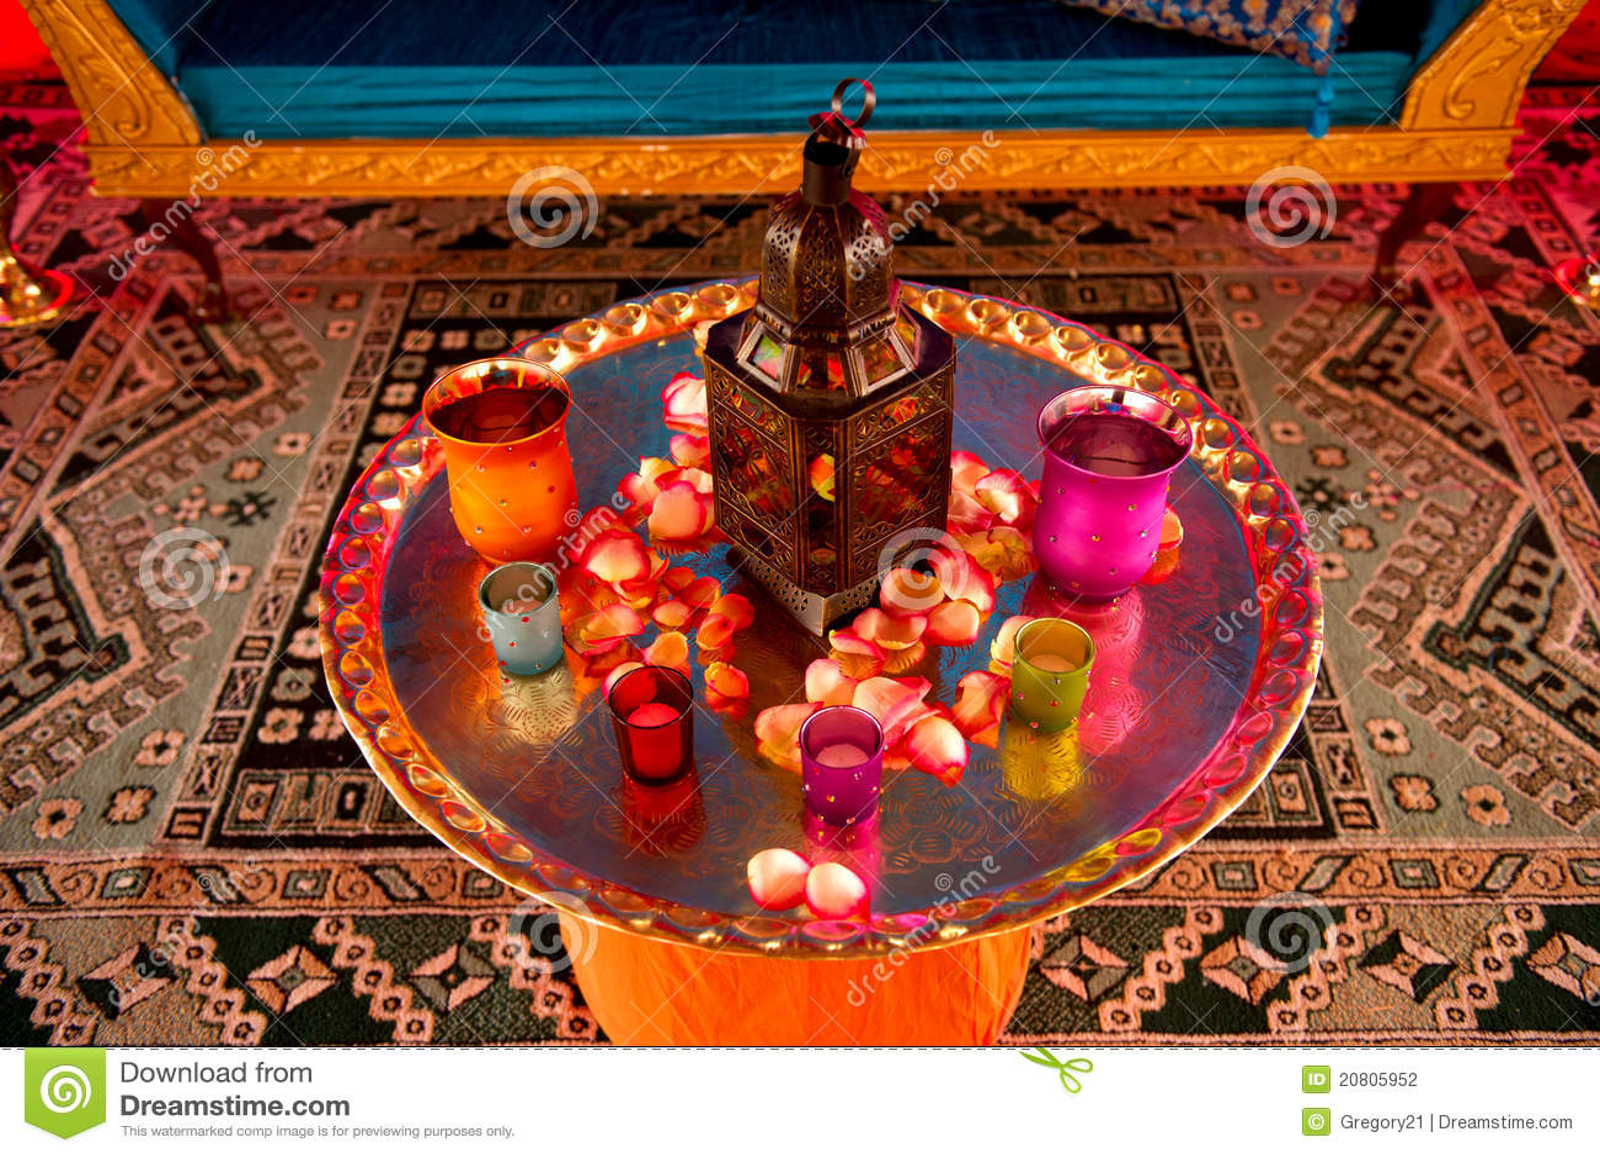 Indian Wedding Decor Stock Photo Image Of Glass Modern